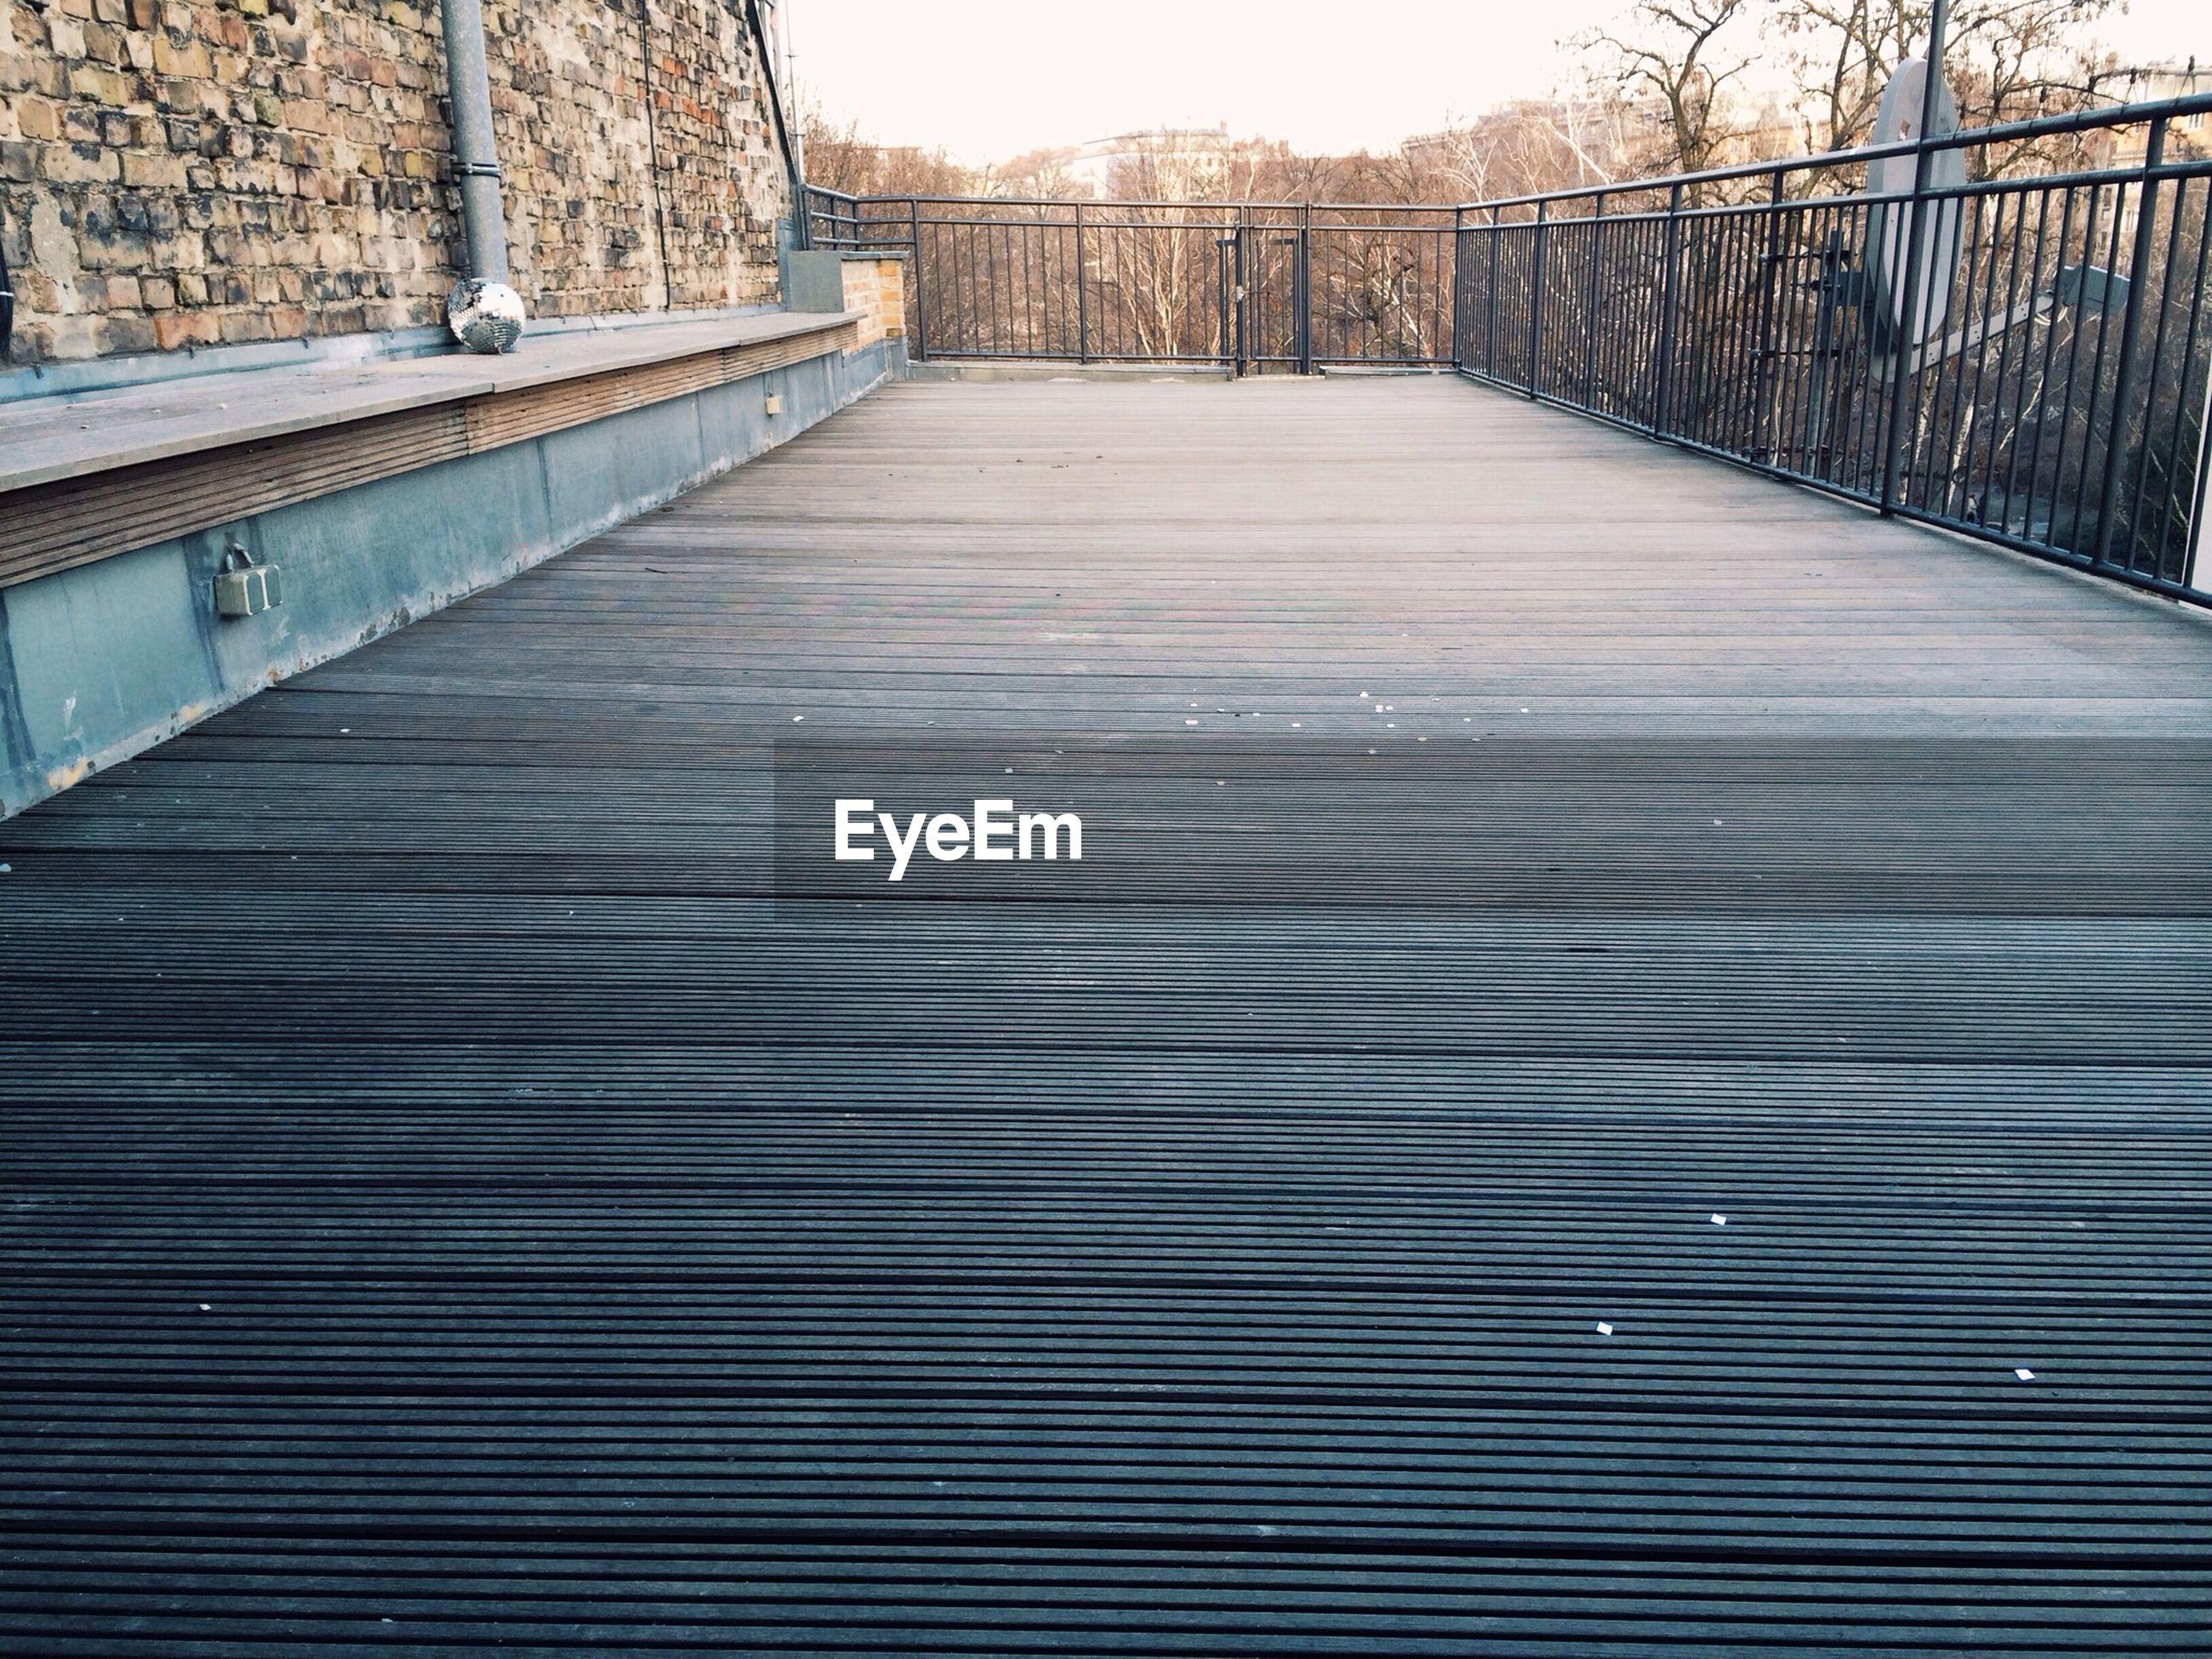 Surface level of walkway along railings